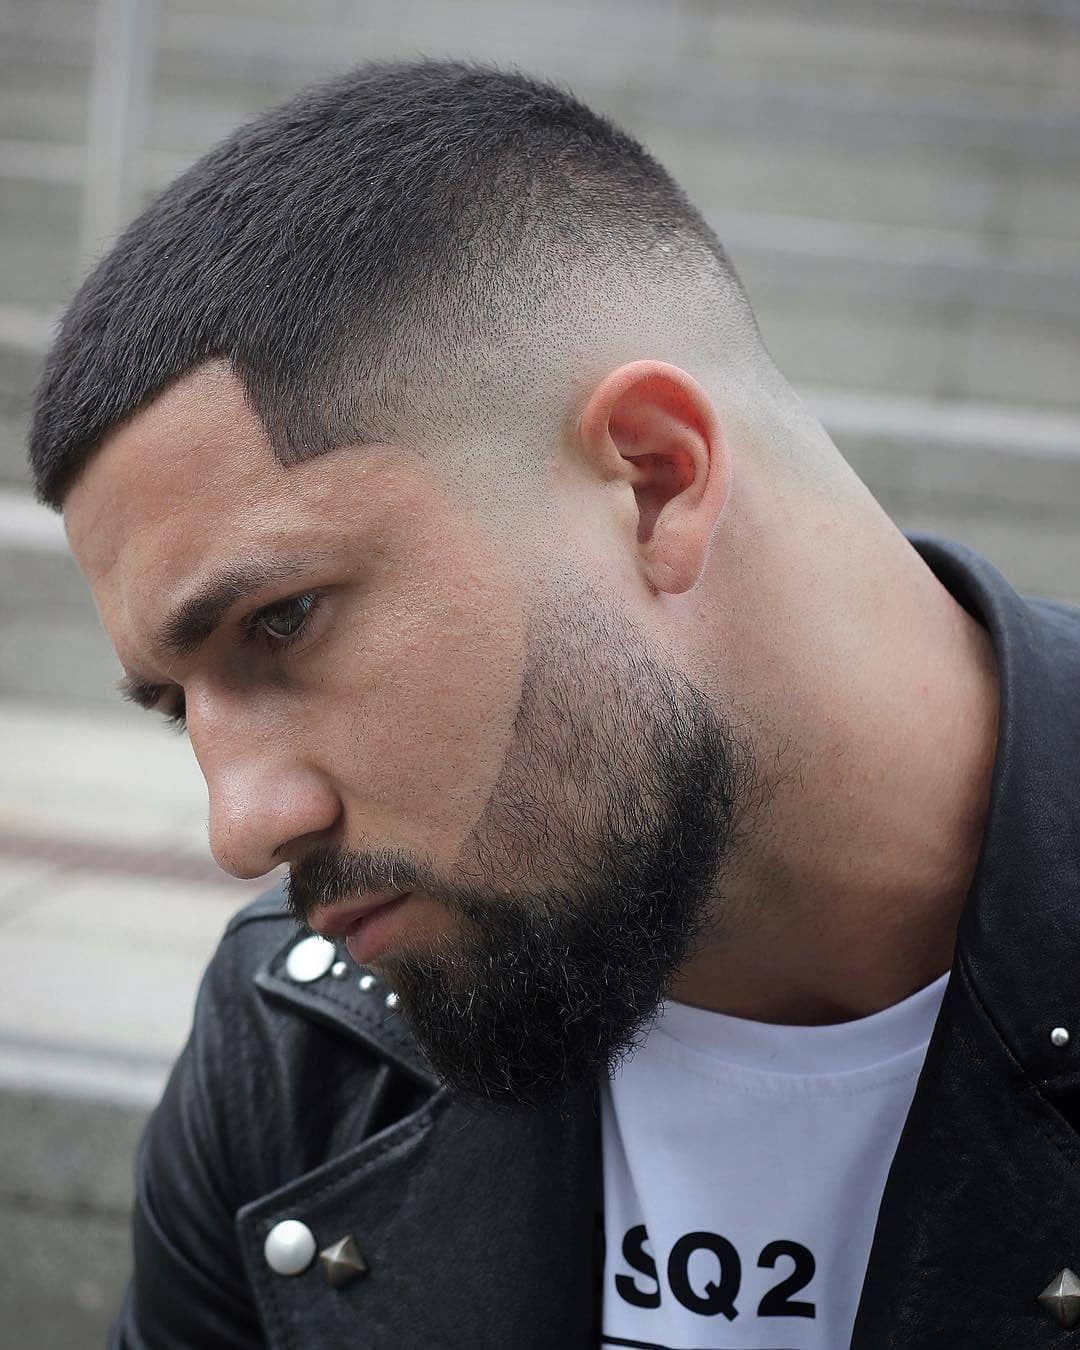 Pin By Blakbear236 Rayford On Hair Man Mens Haircuts Short Haircuts For Men Mens Hairstyles Short